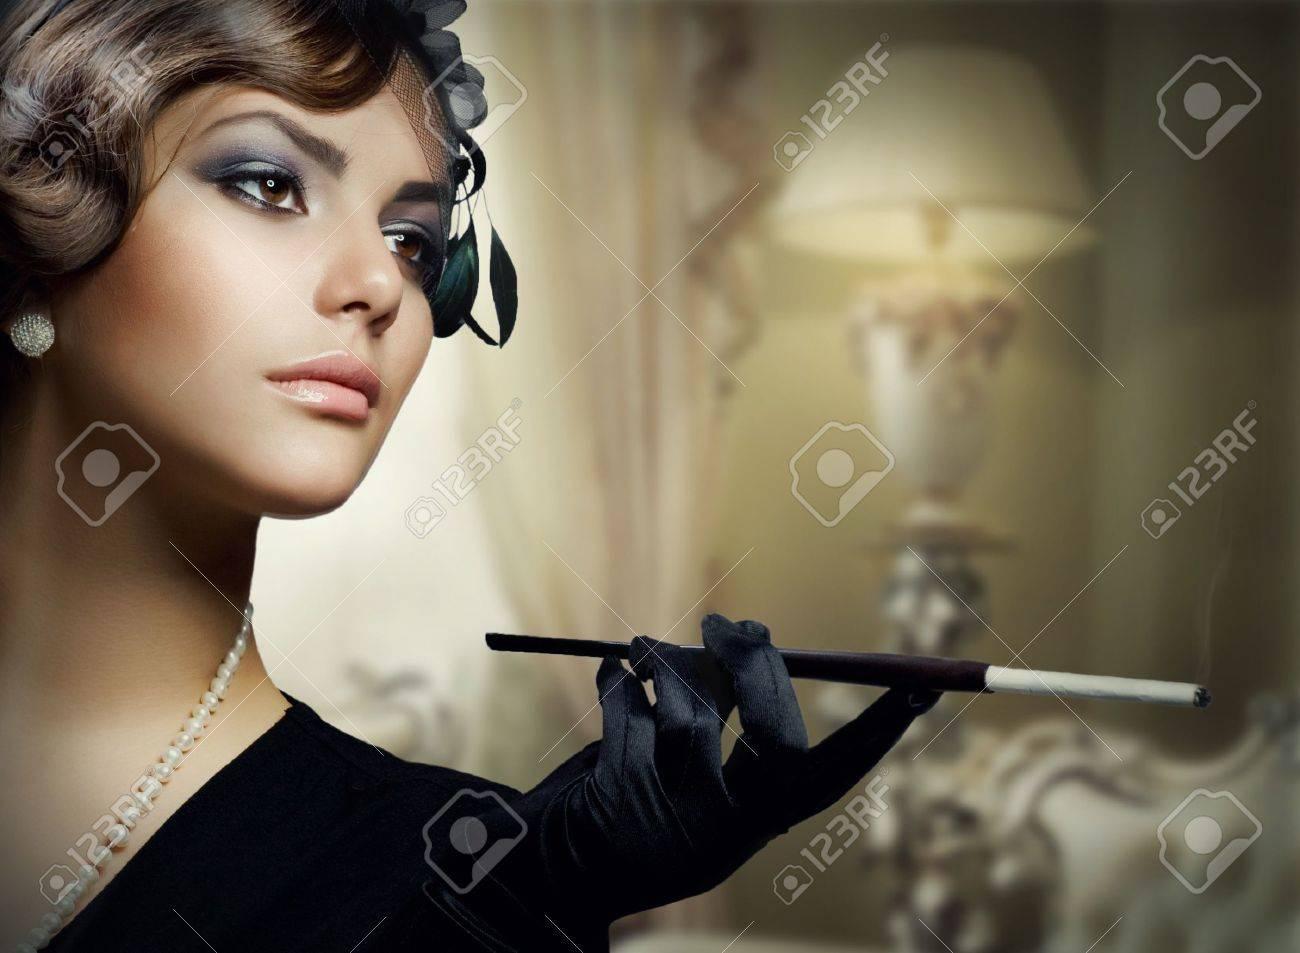 Romantic Beauty. Retro Style Stock Photo - 8382522